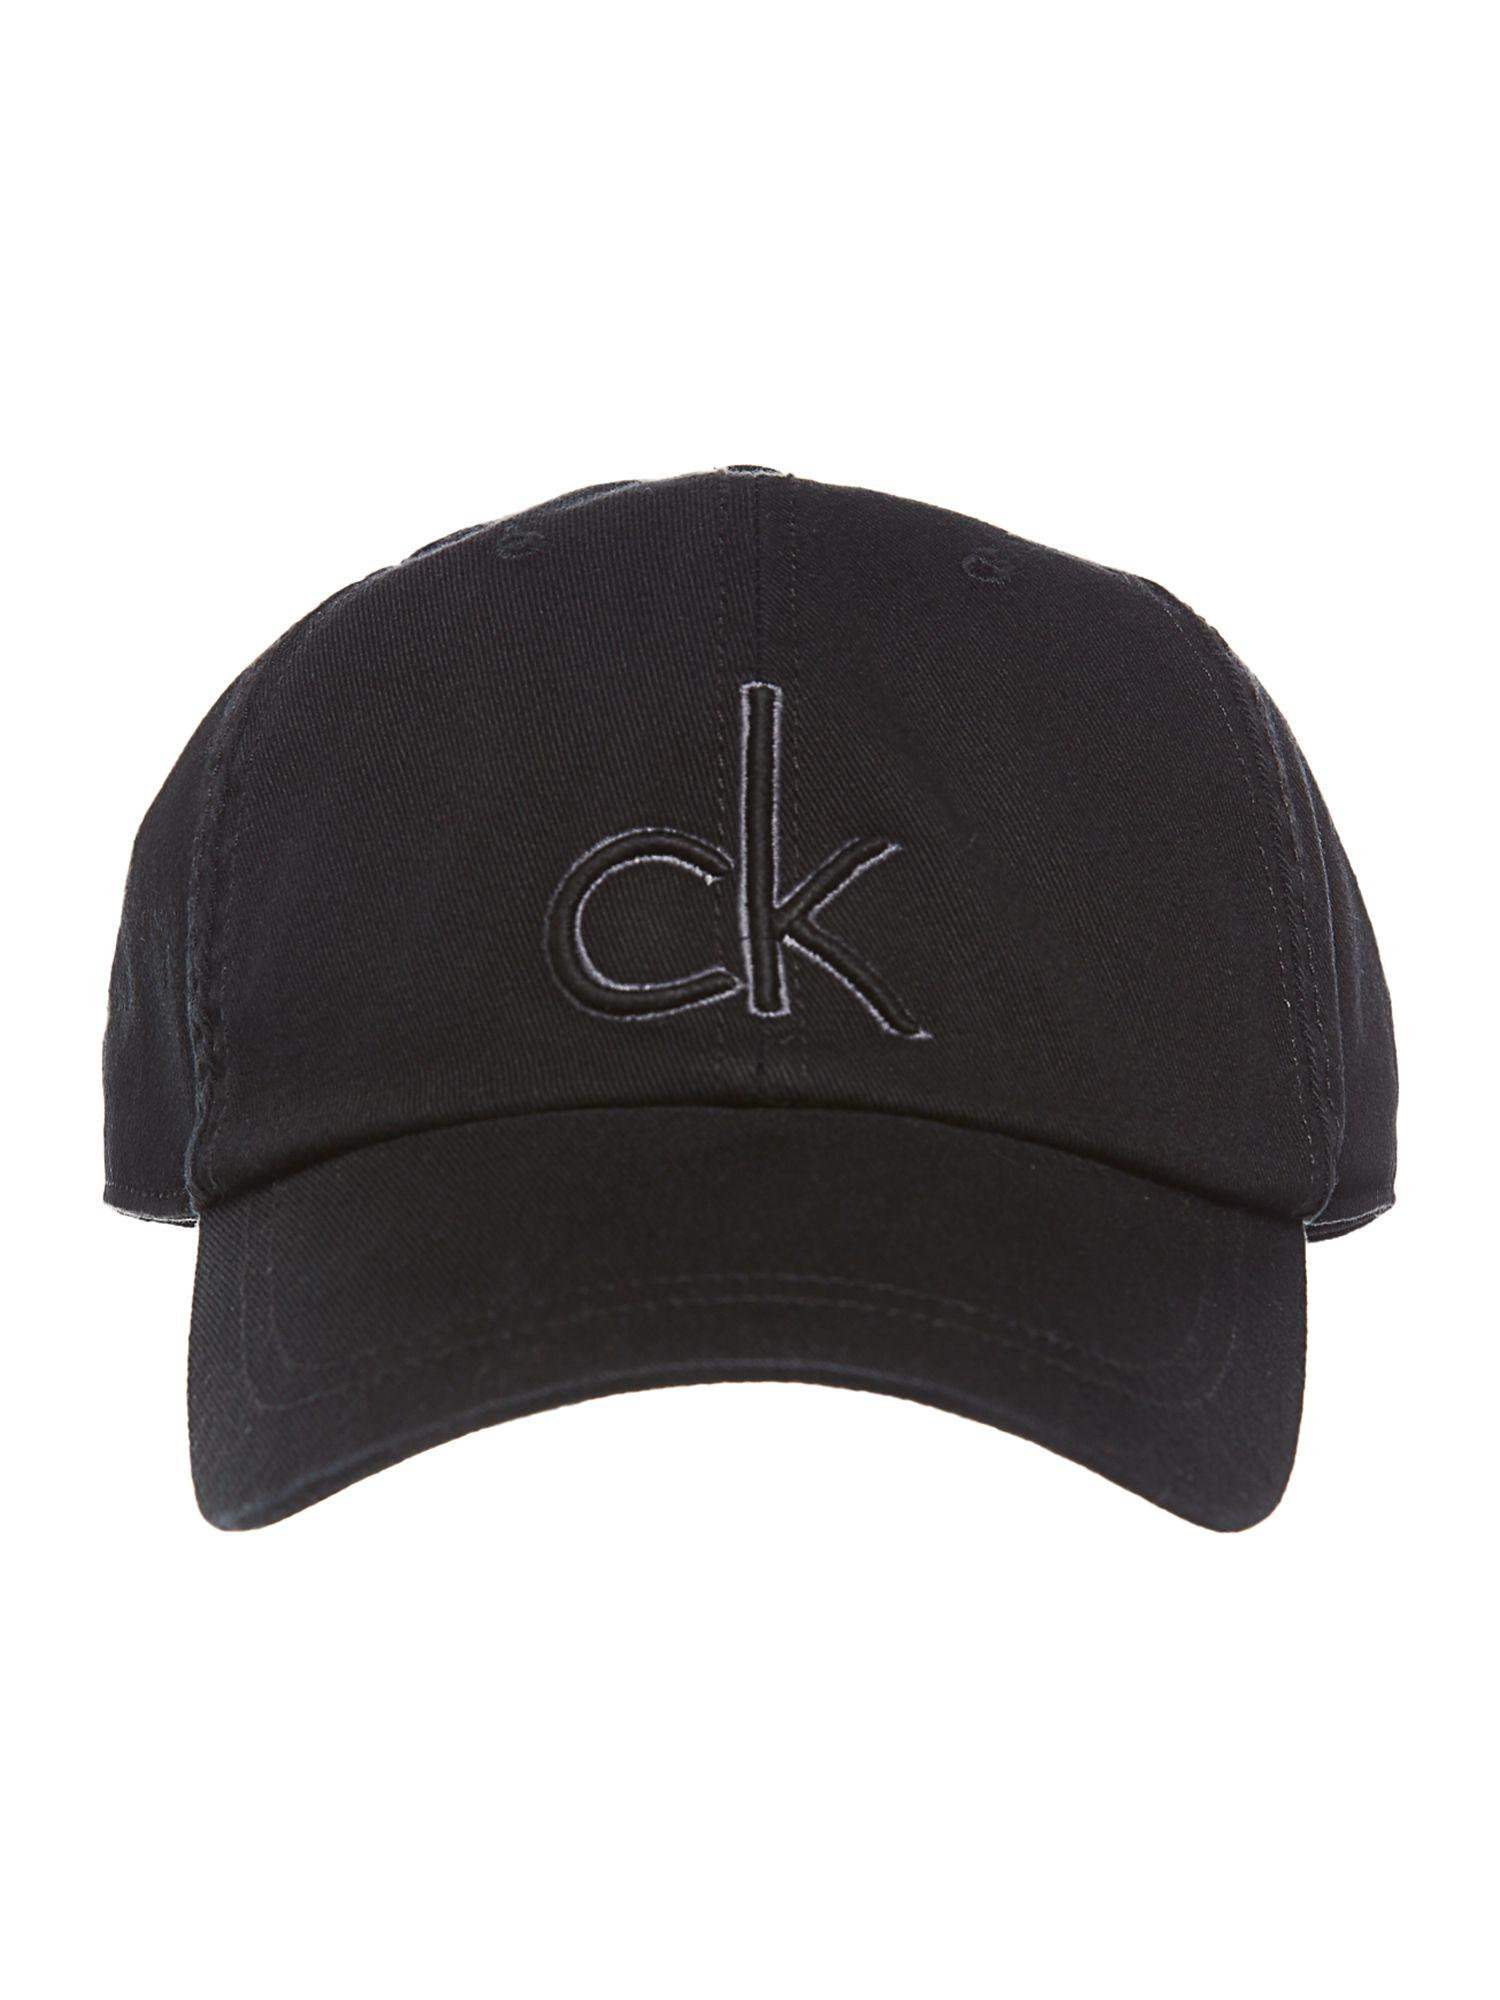 calvin klein classic logo cap in black for men lyst. Black Bedroom Furniture Sets. Home Design Ideas